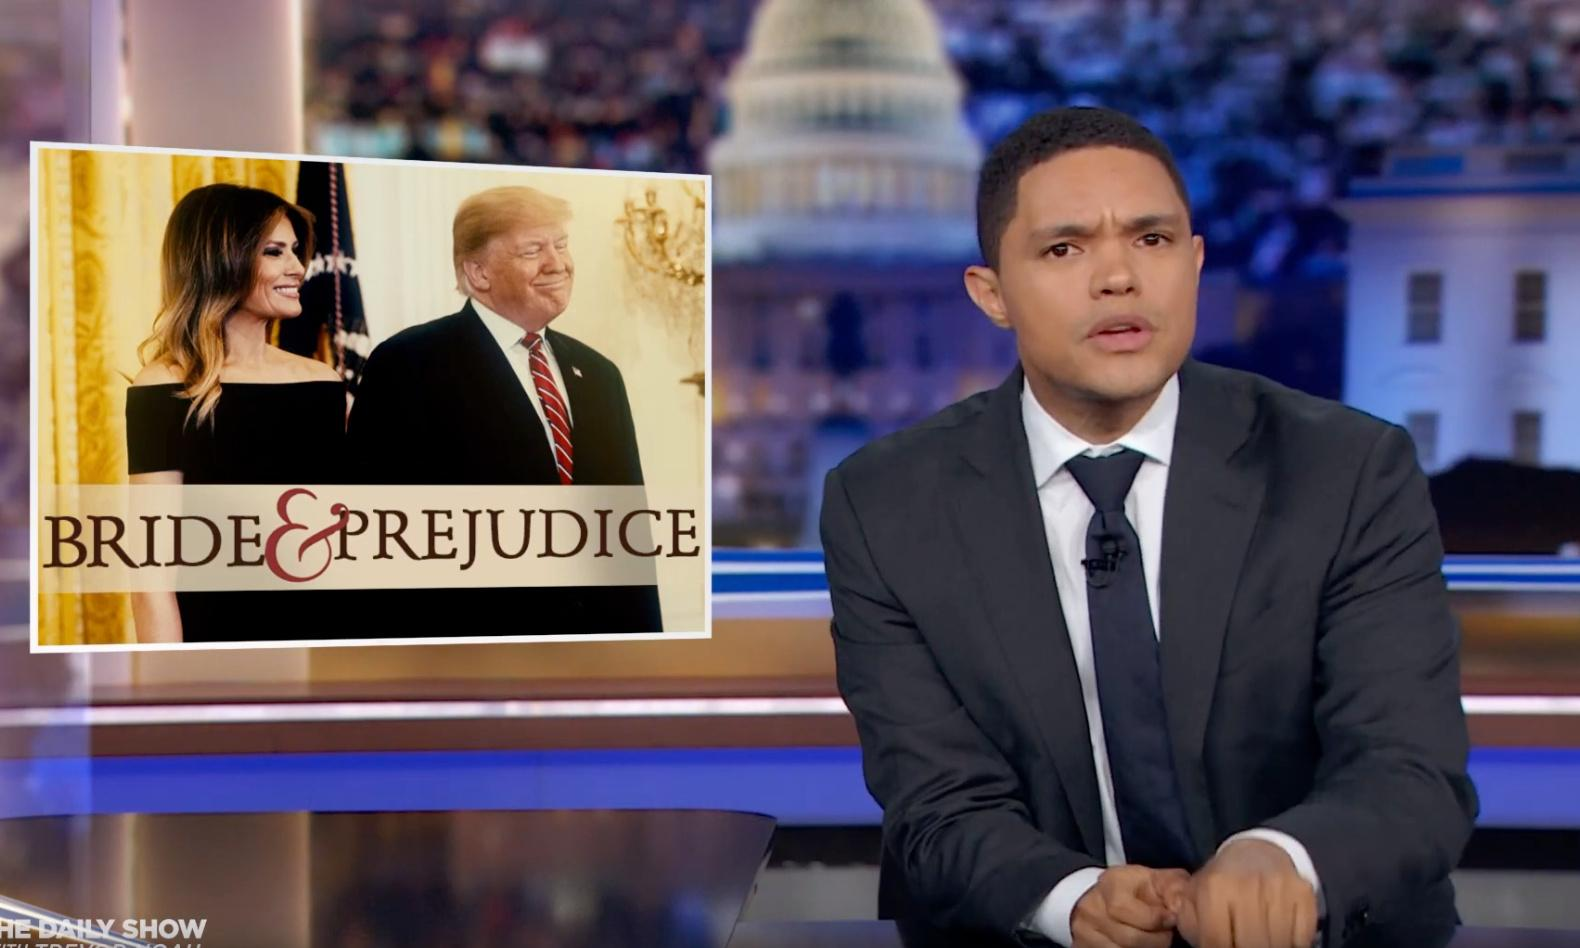 Trevor Noah: 'I think Donald Trump is trying to deport Melania'